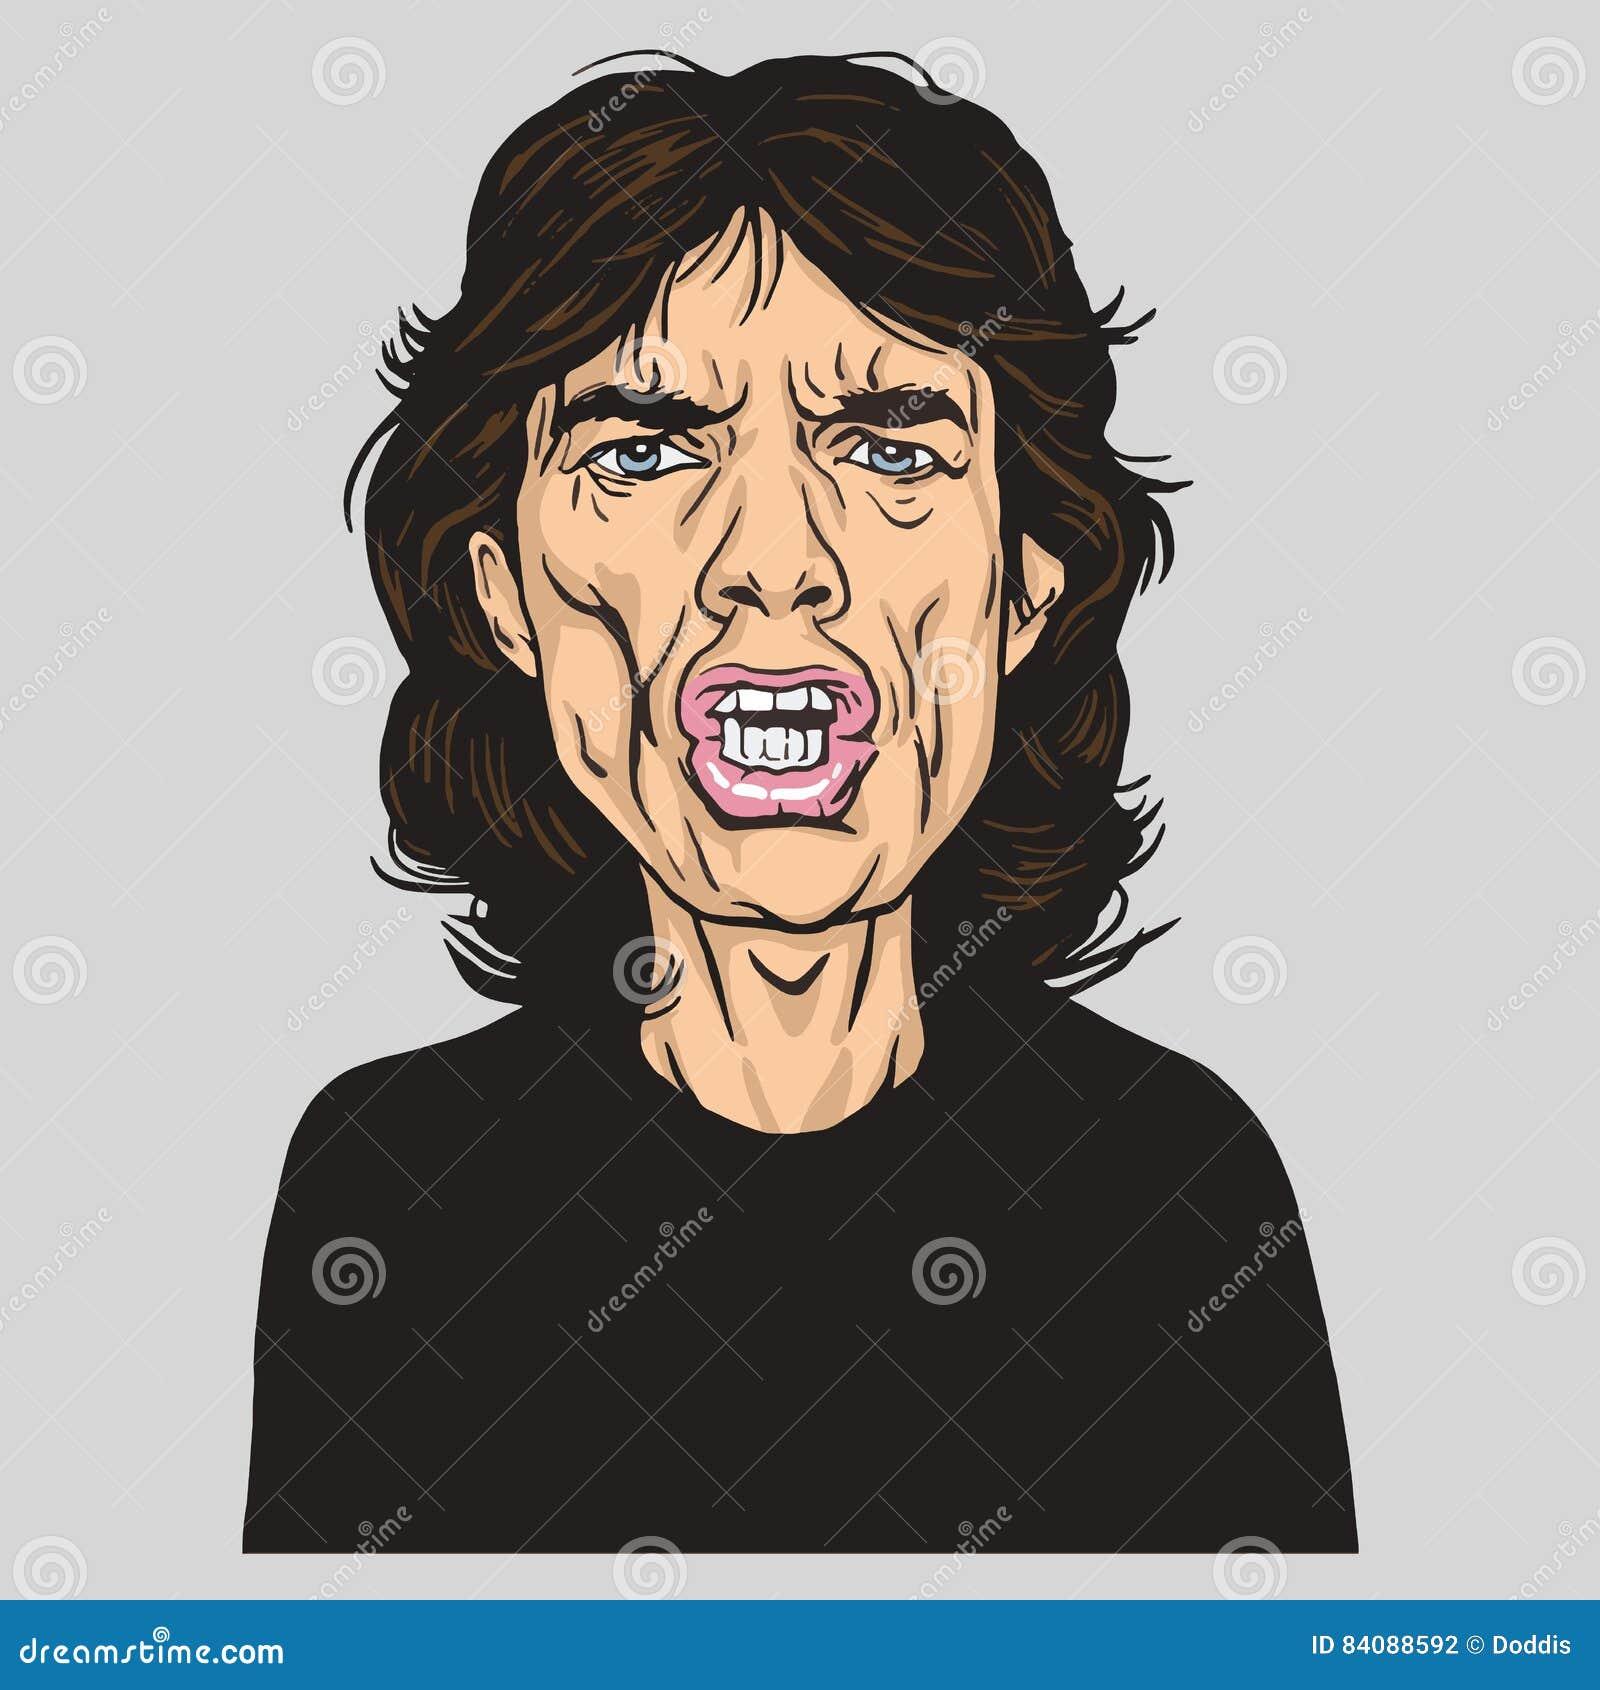 Caricatura de Mick Jagger Vector Portrait Illustration